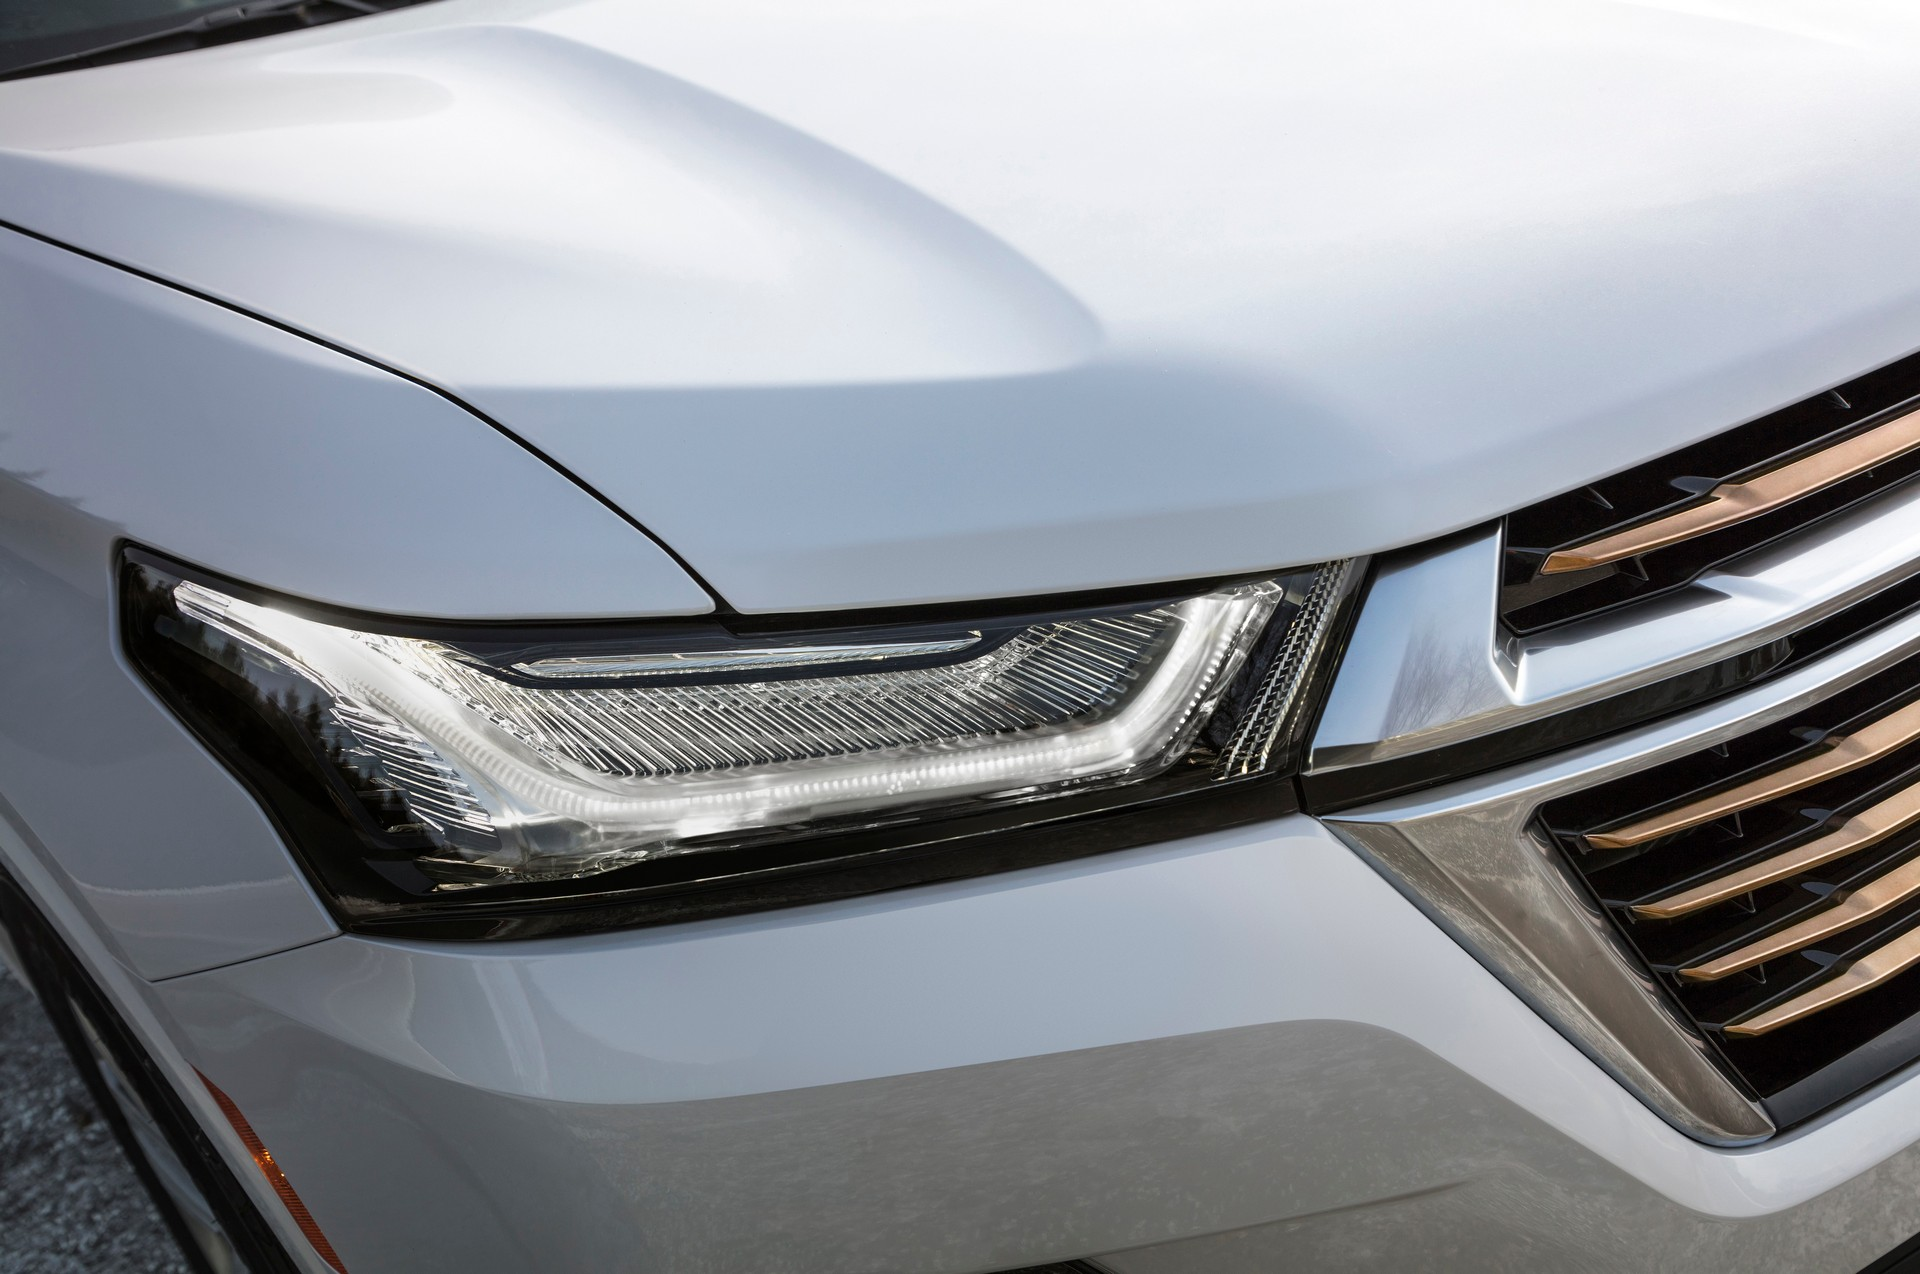 2021-Chevrolet-Traverse-5